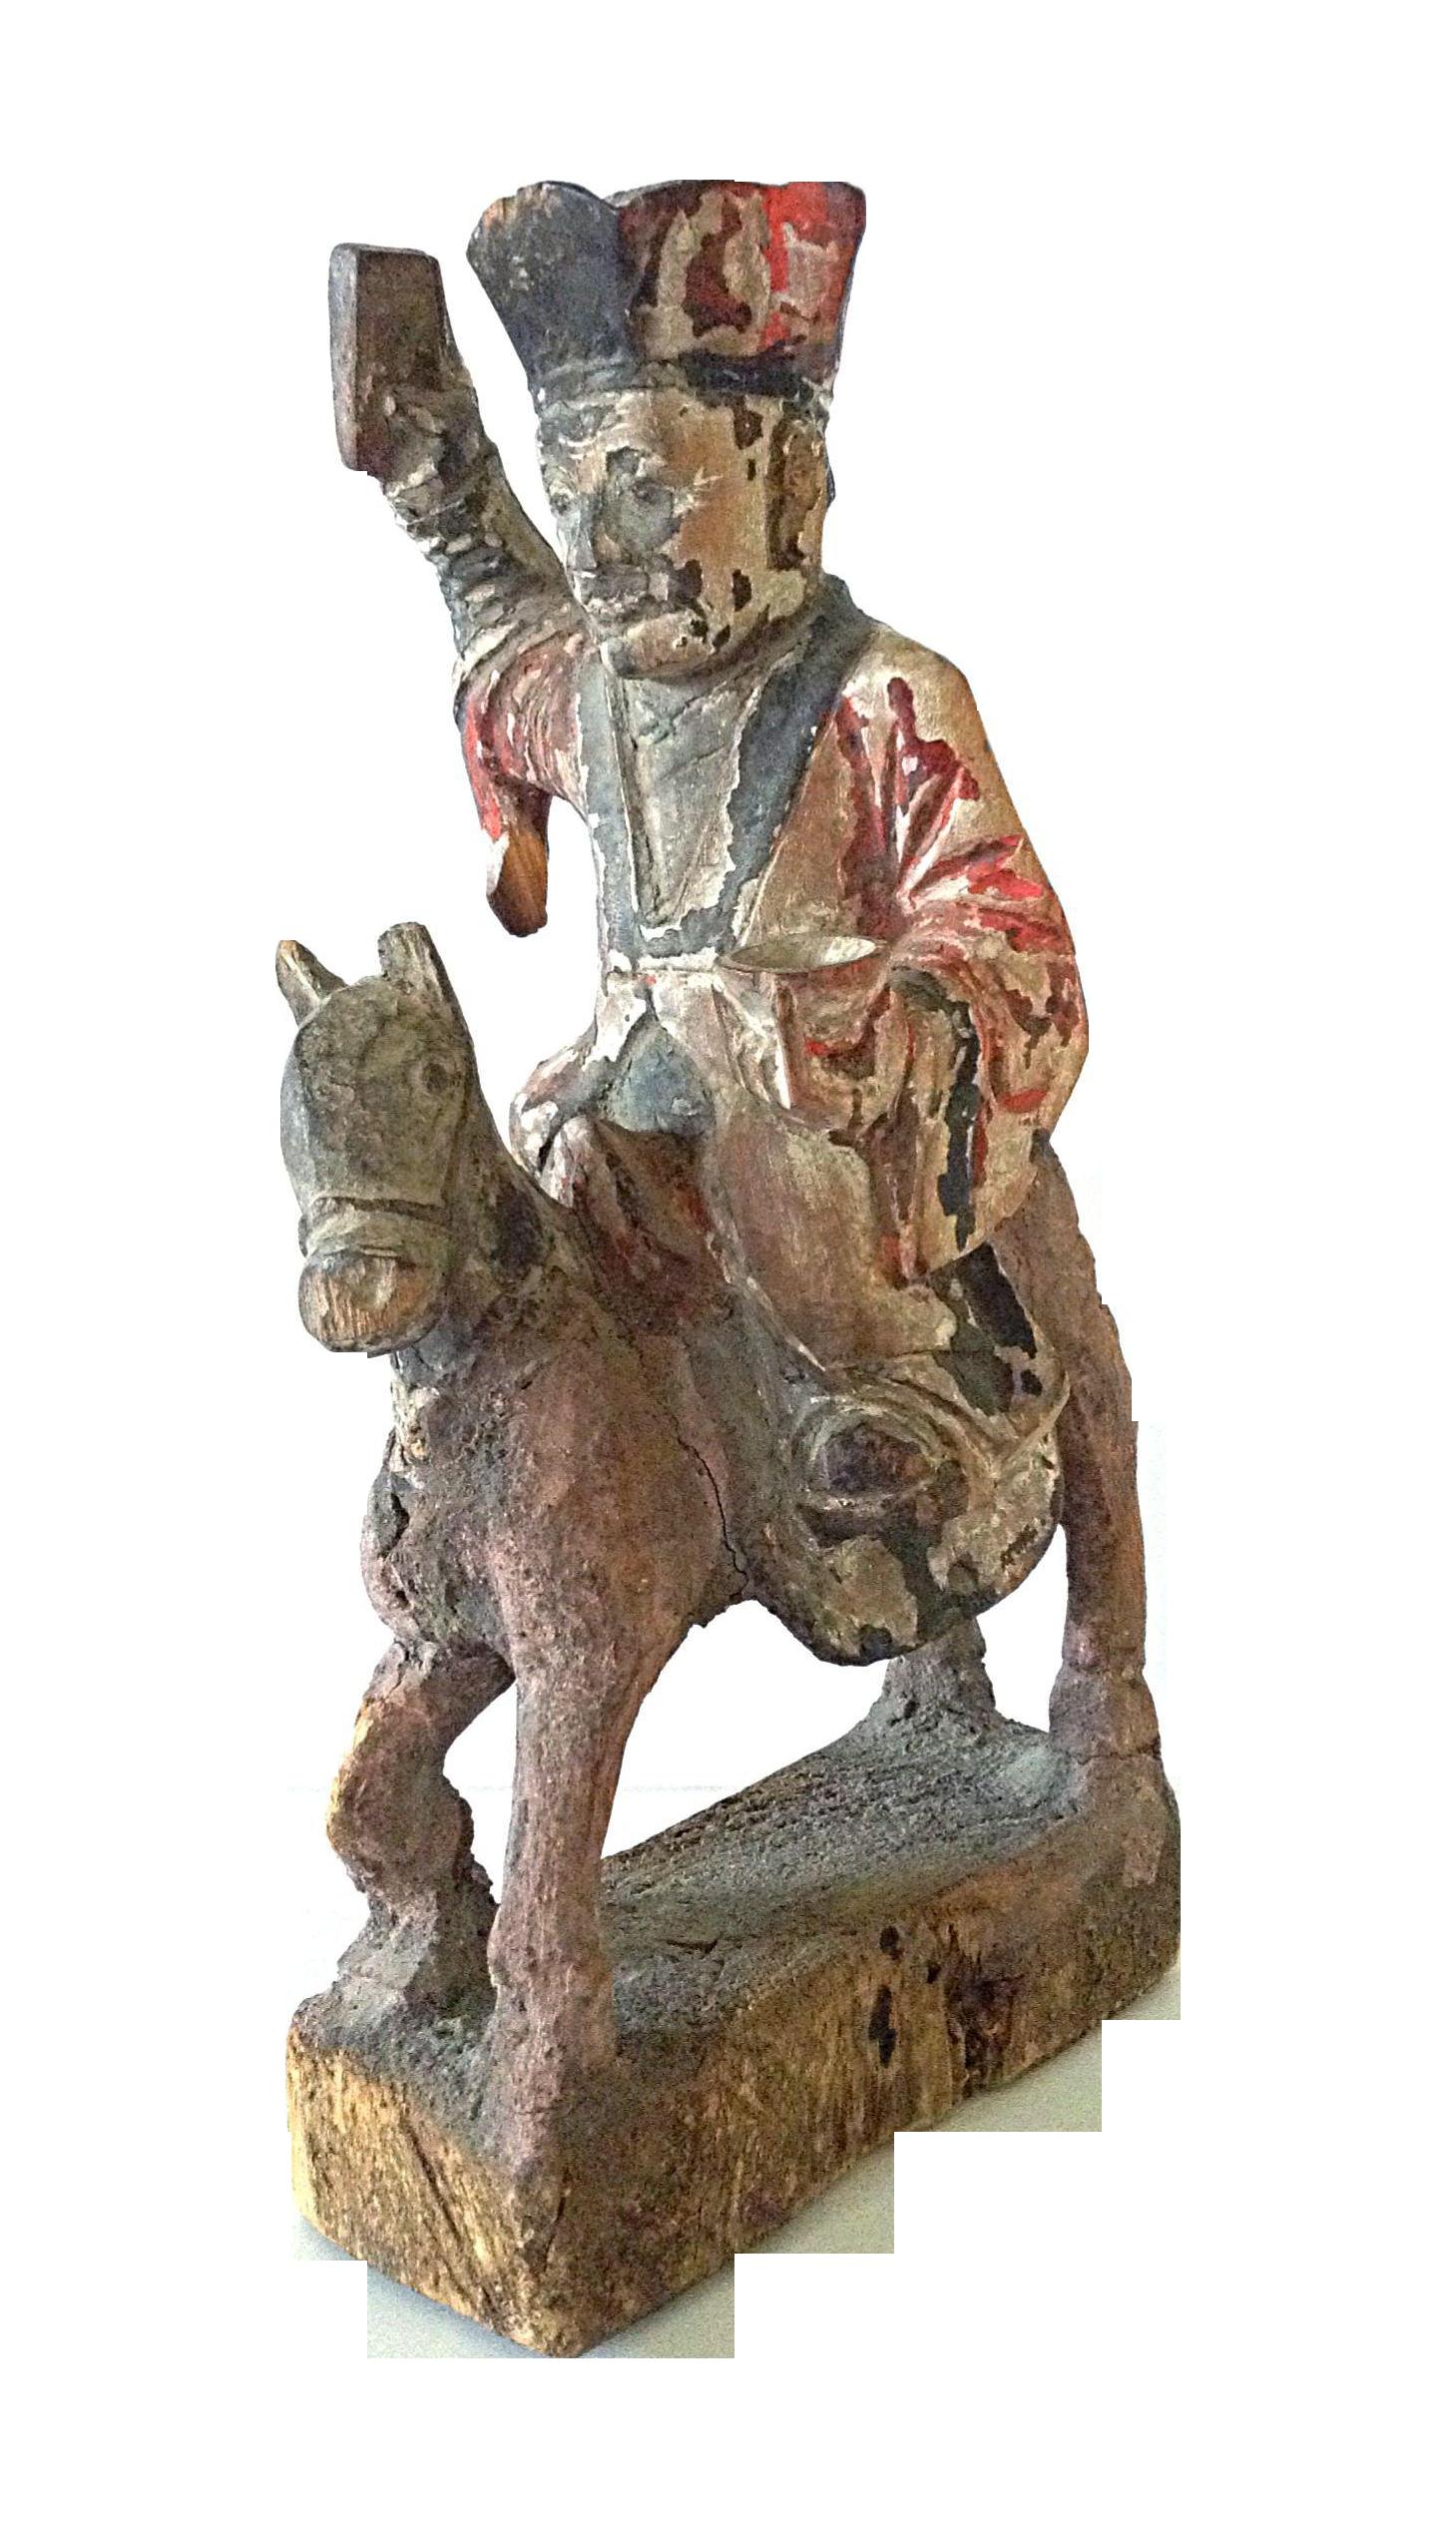 15th C. Chinese Wooden Prayer Figure on Chairish.com